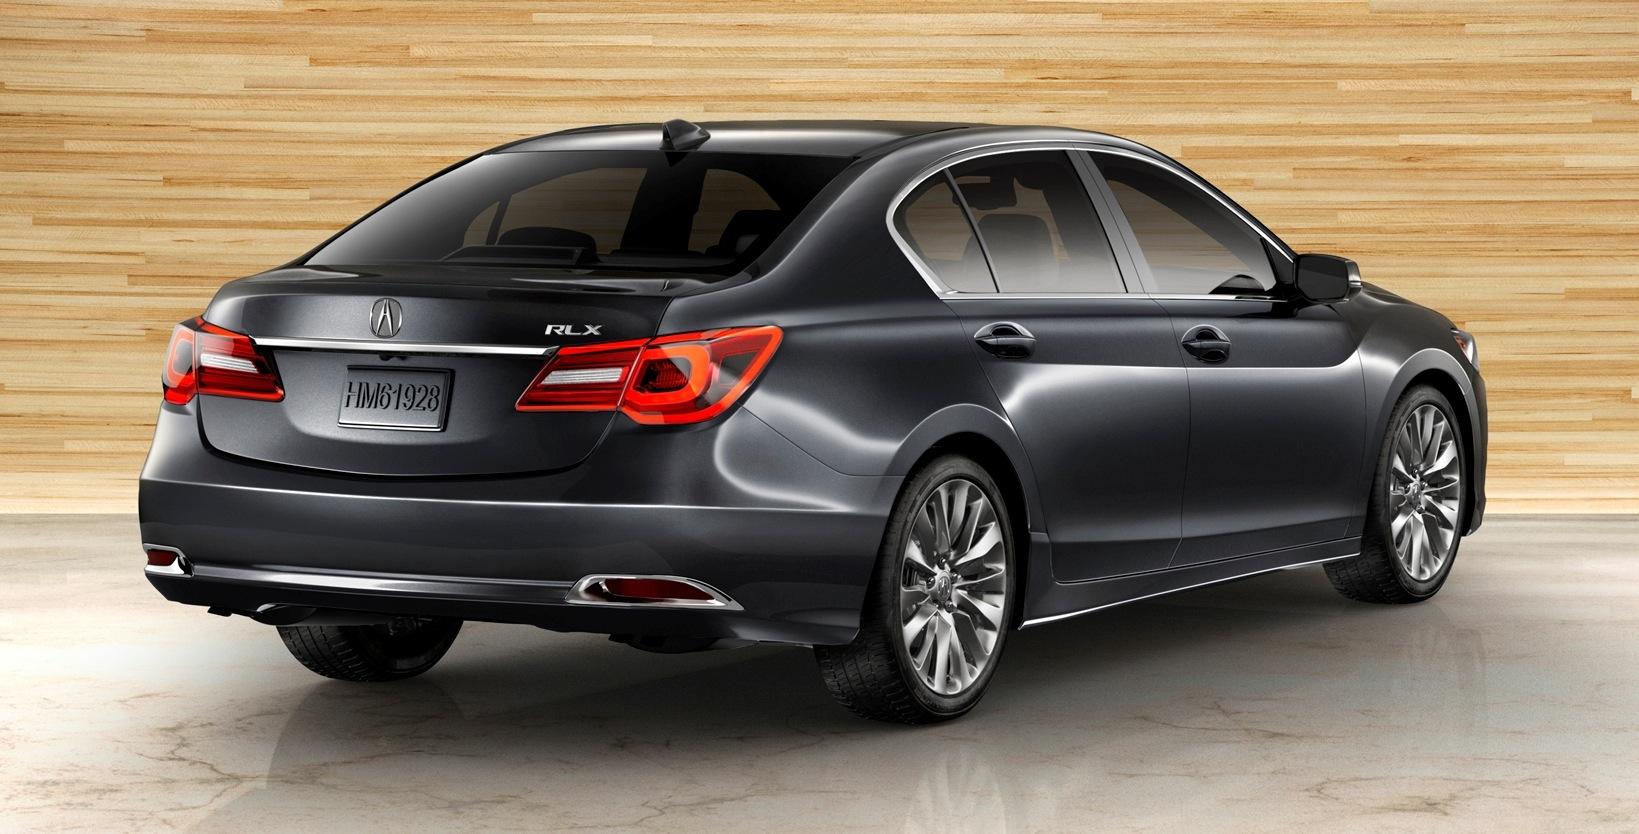 Used Acura Rlx For Sale Cargurus Autos Post